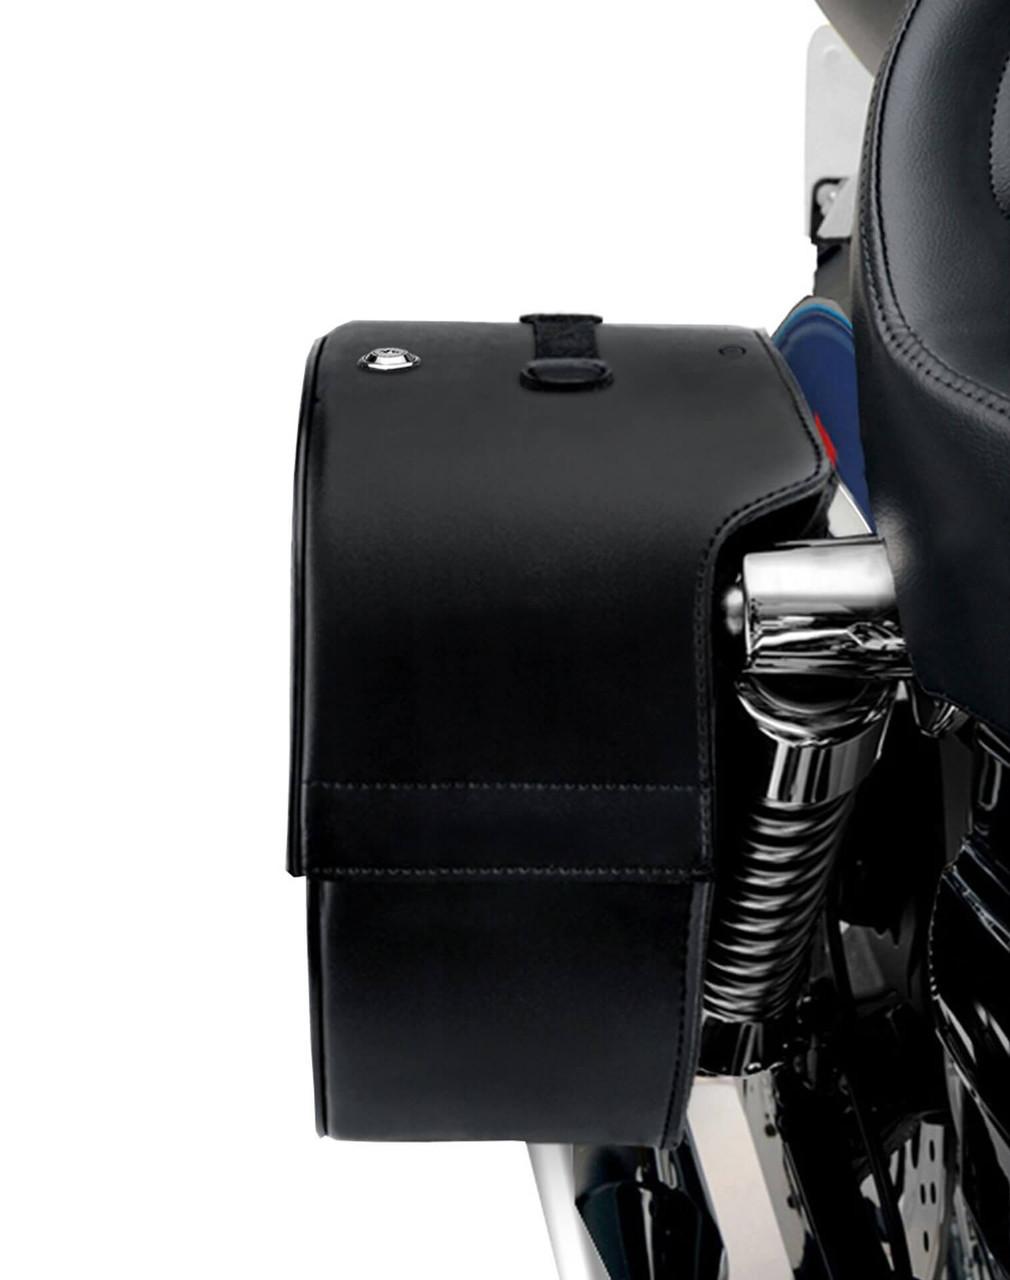 Triumph Thunderbird Spear Shock Cutout Studded Large Motorcycle Saddlebags Key Lock View